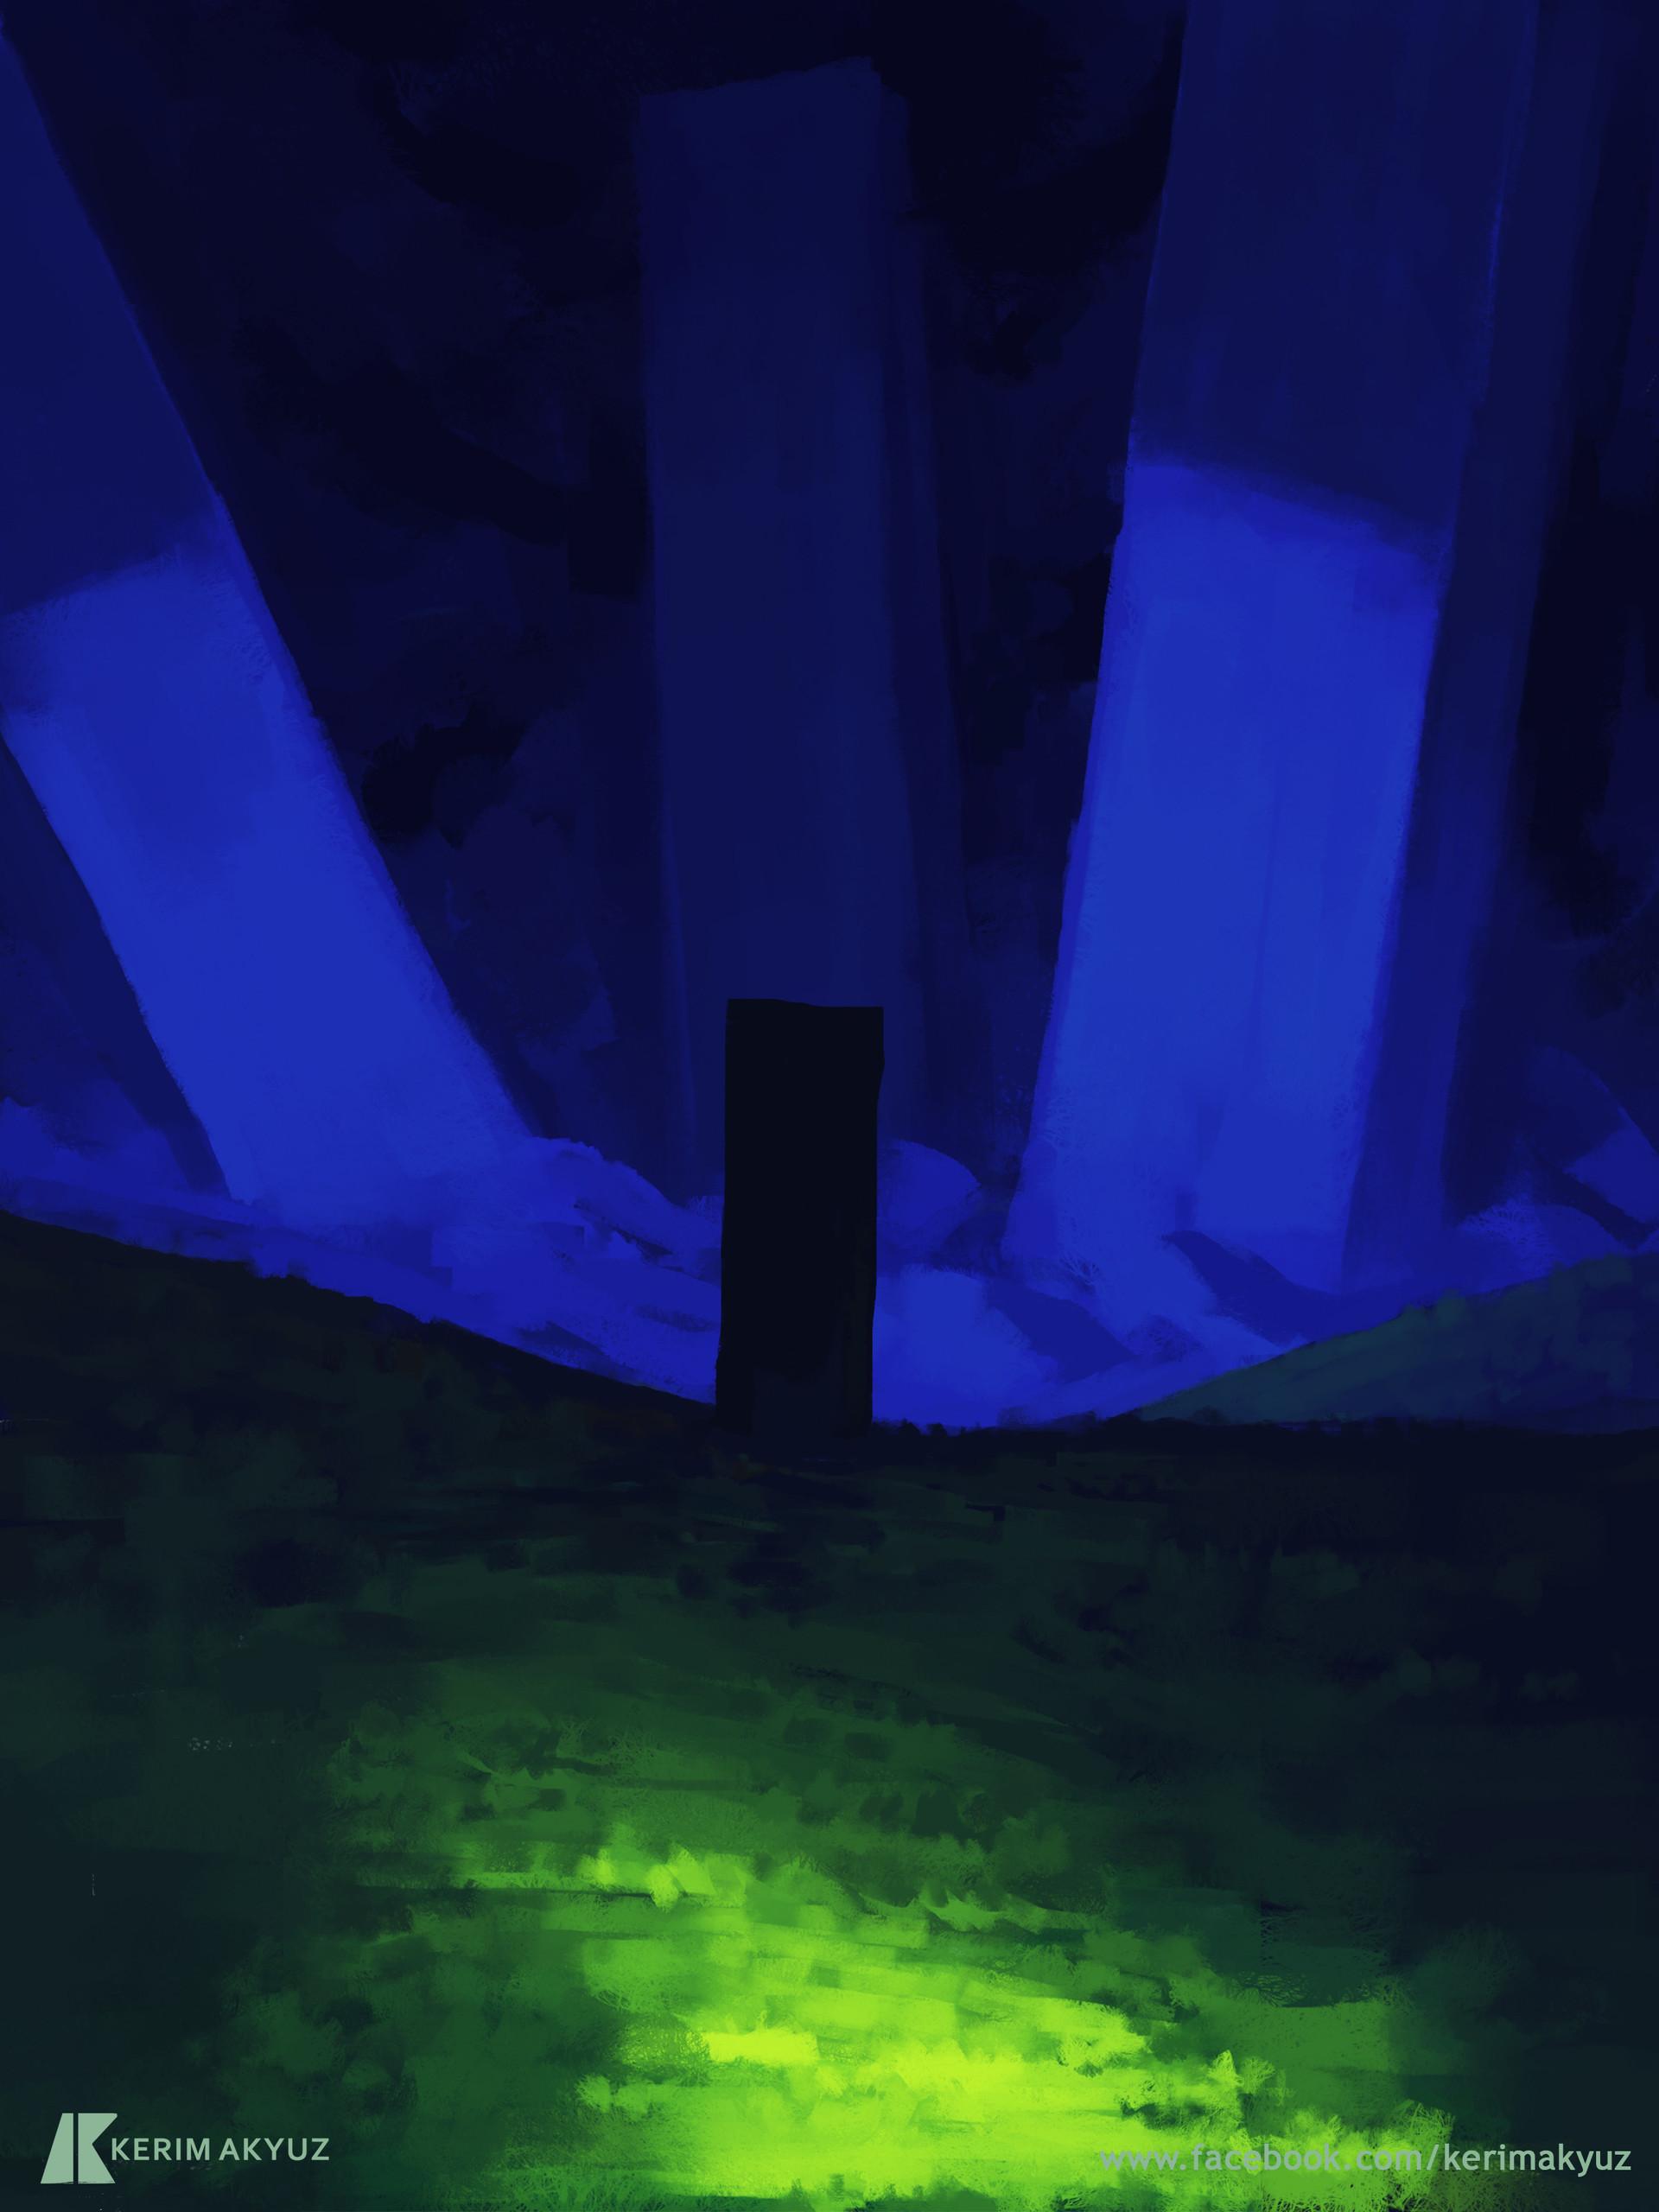 Kerim akyuz 277 monolith2